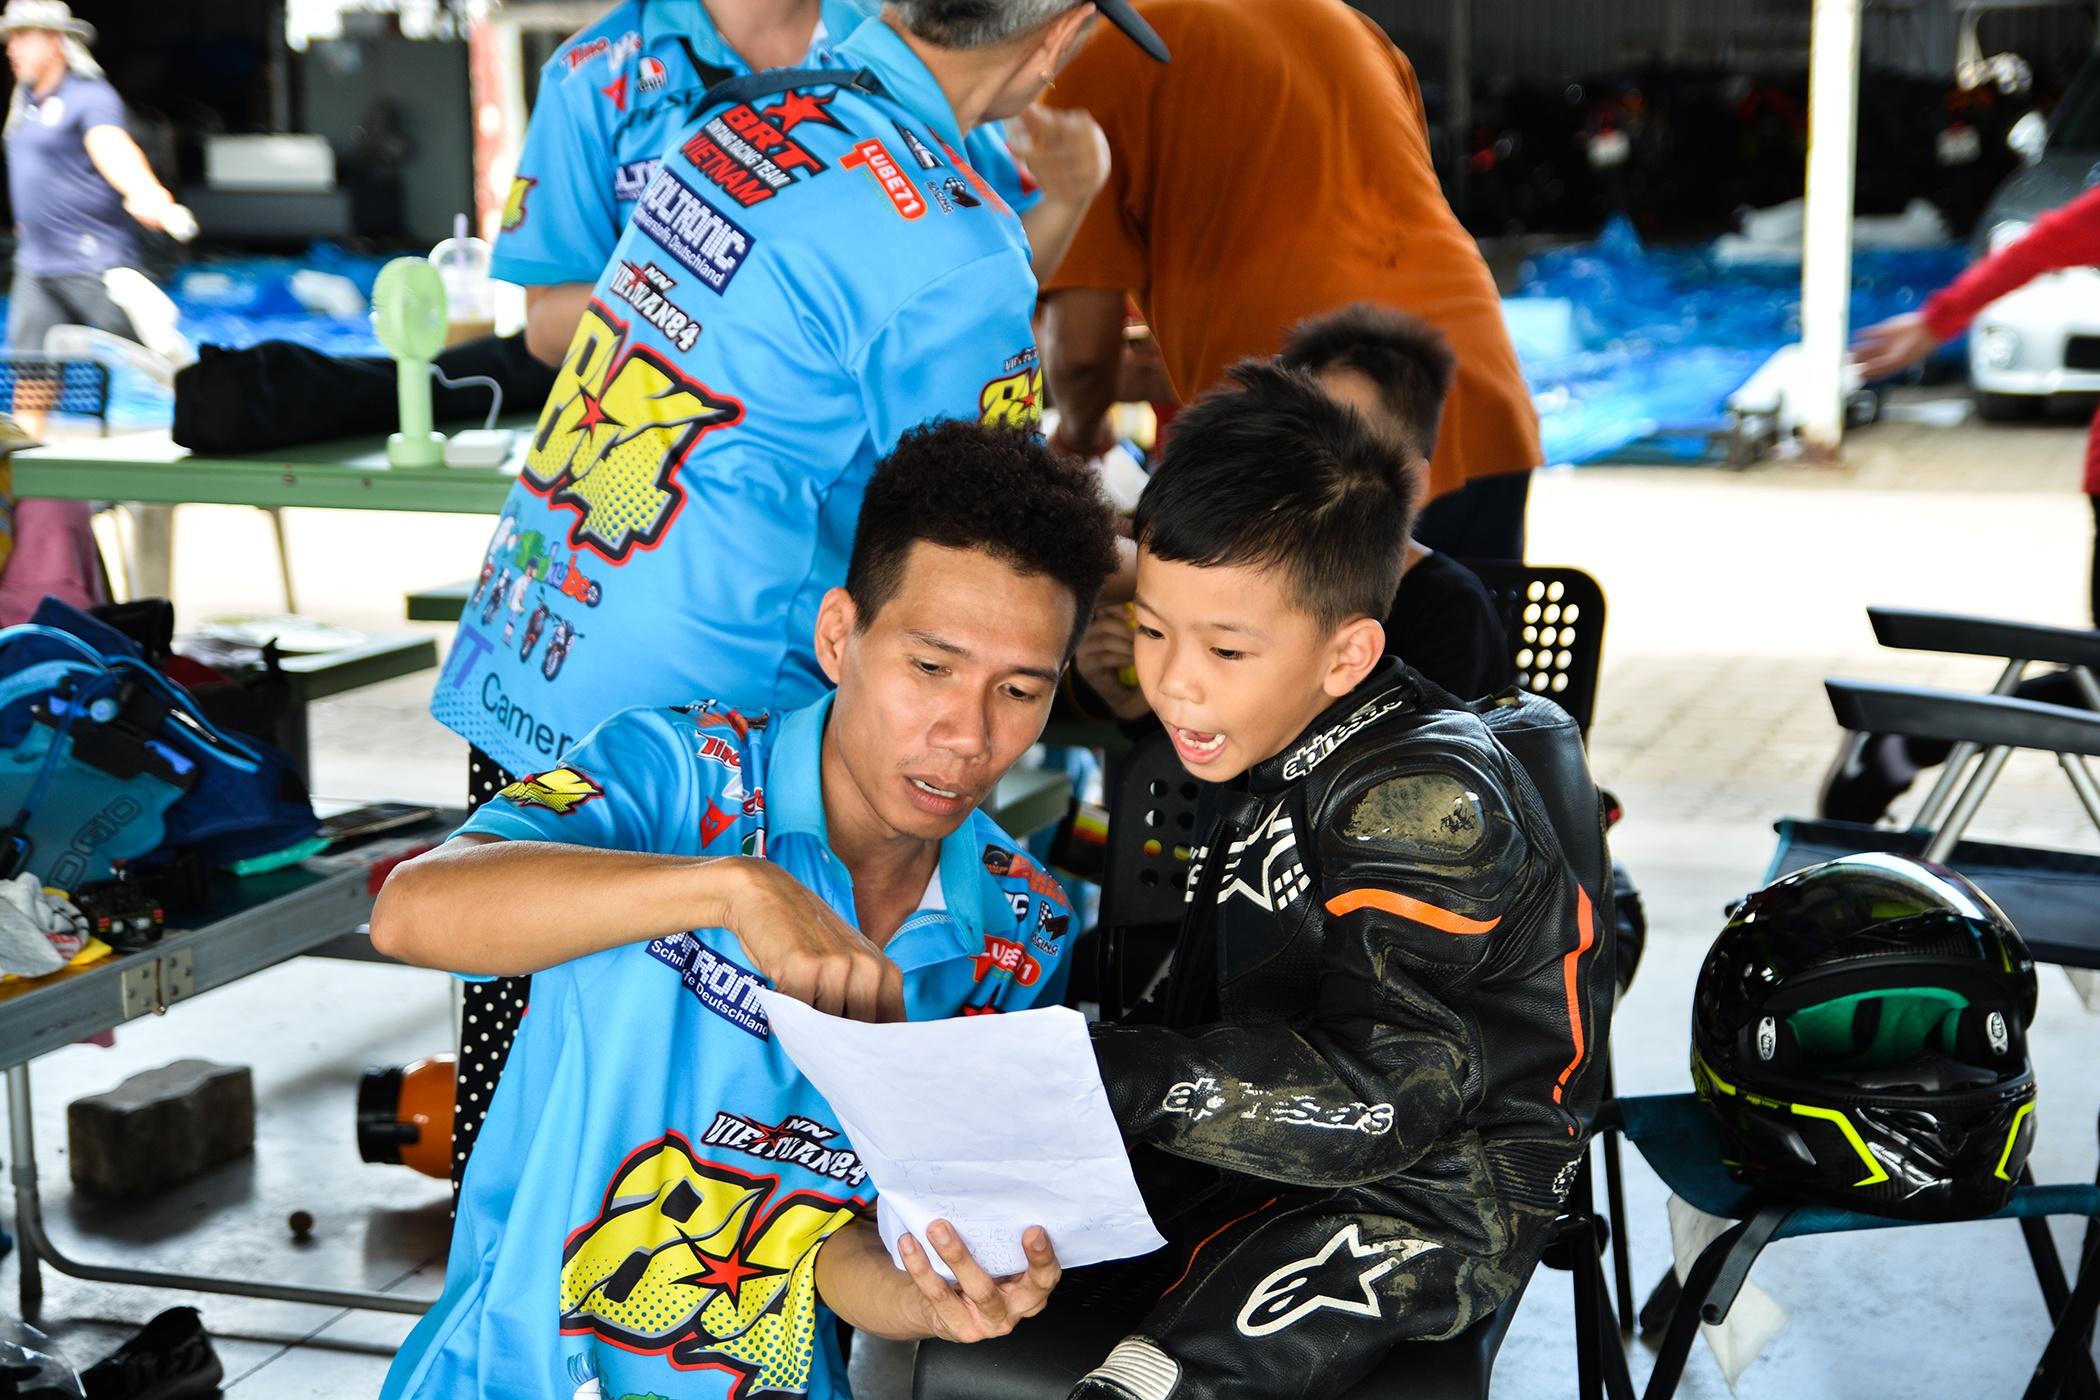 Giai dua moto tre em o Thai Lan va nhung giac mo MotoGP hinh anh 7